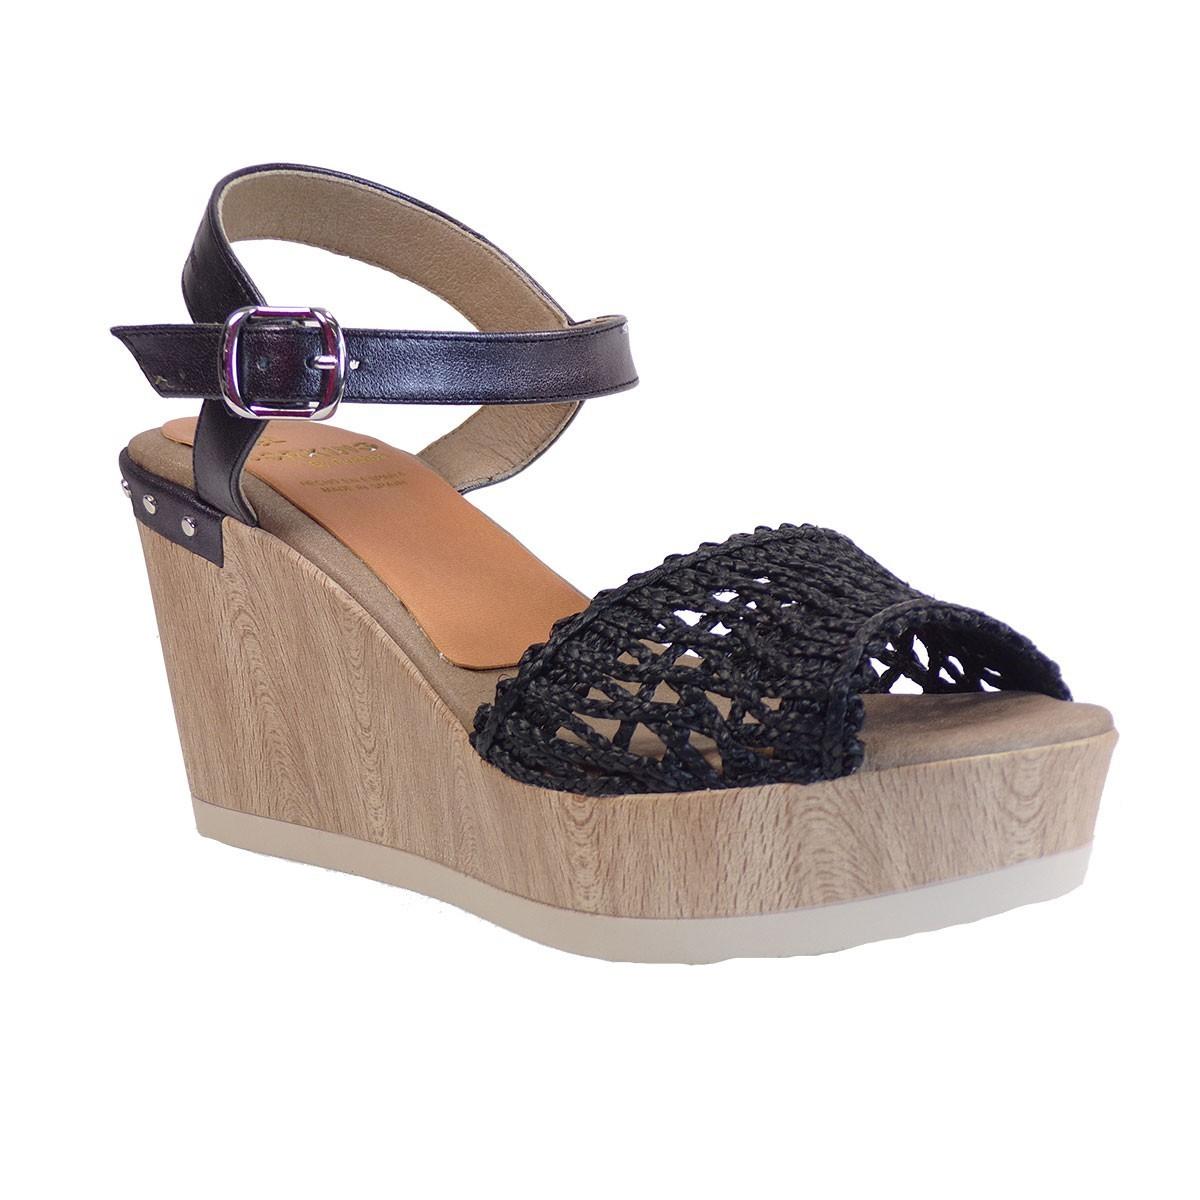 Dorkings Γυναικεία Παπούτσια Πλατφόρμες D7757-REEF Μαύρο